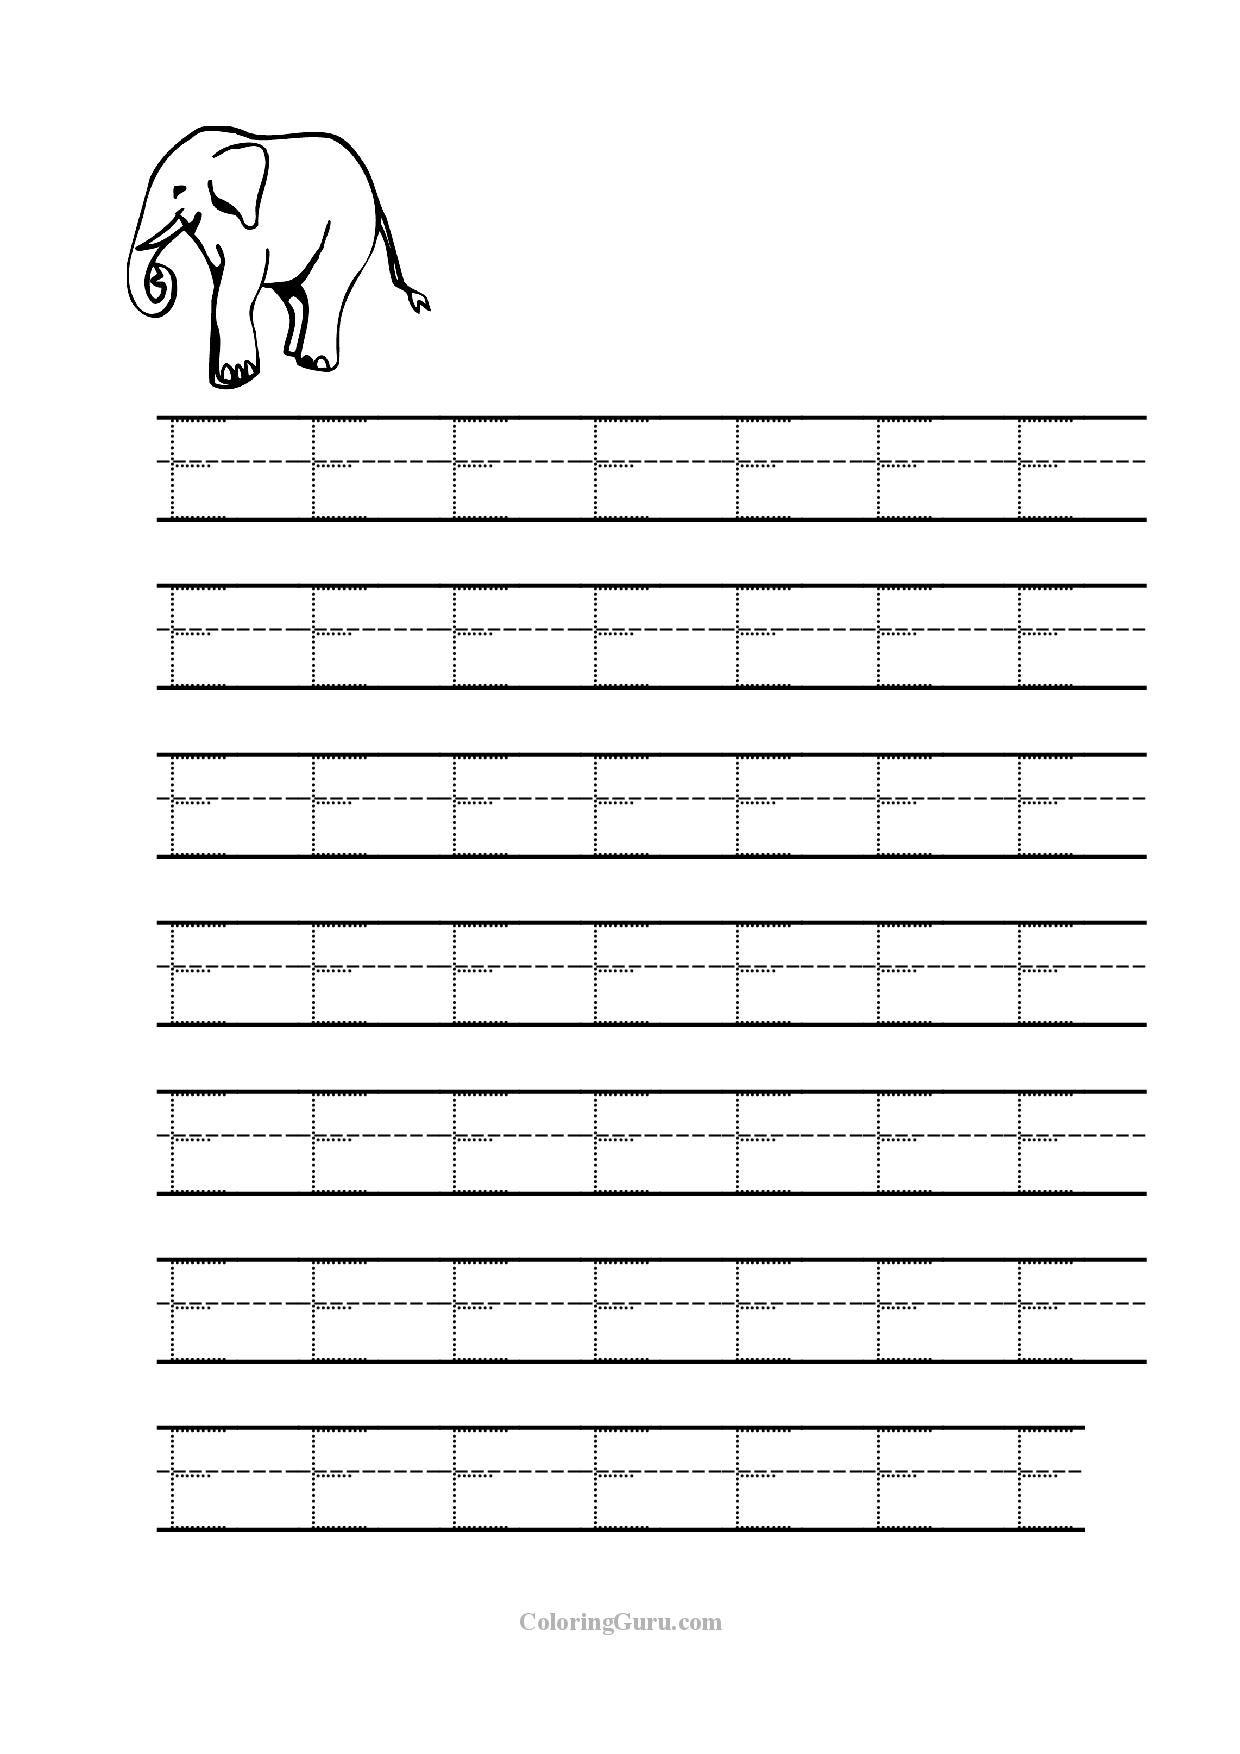 Tracing Letter D Worksheets For Preschool